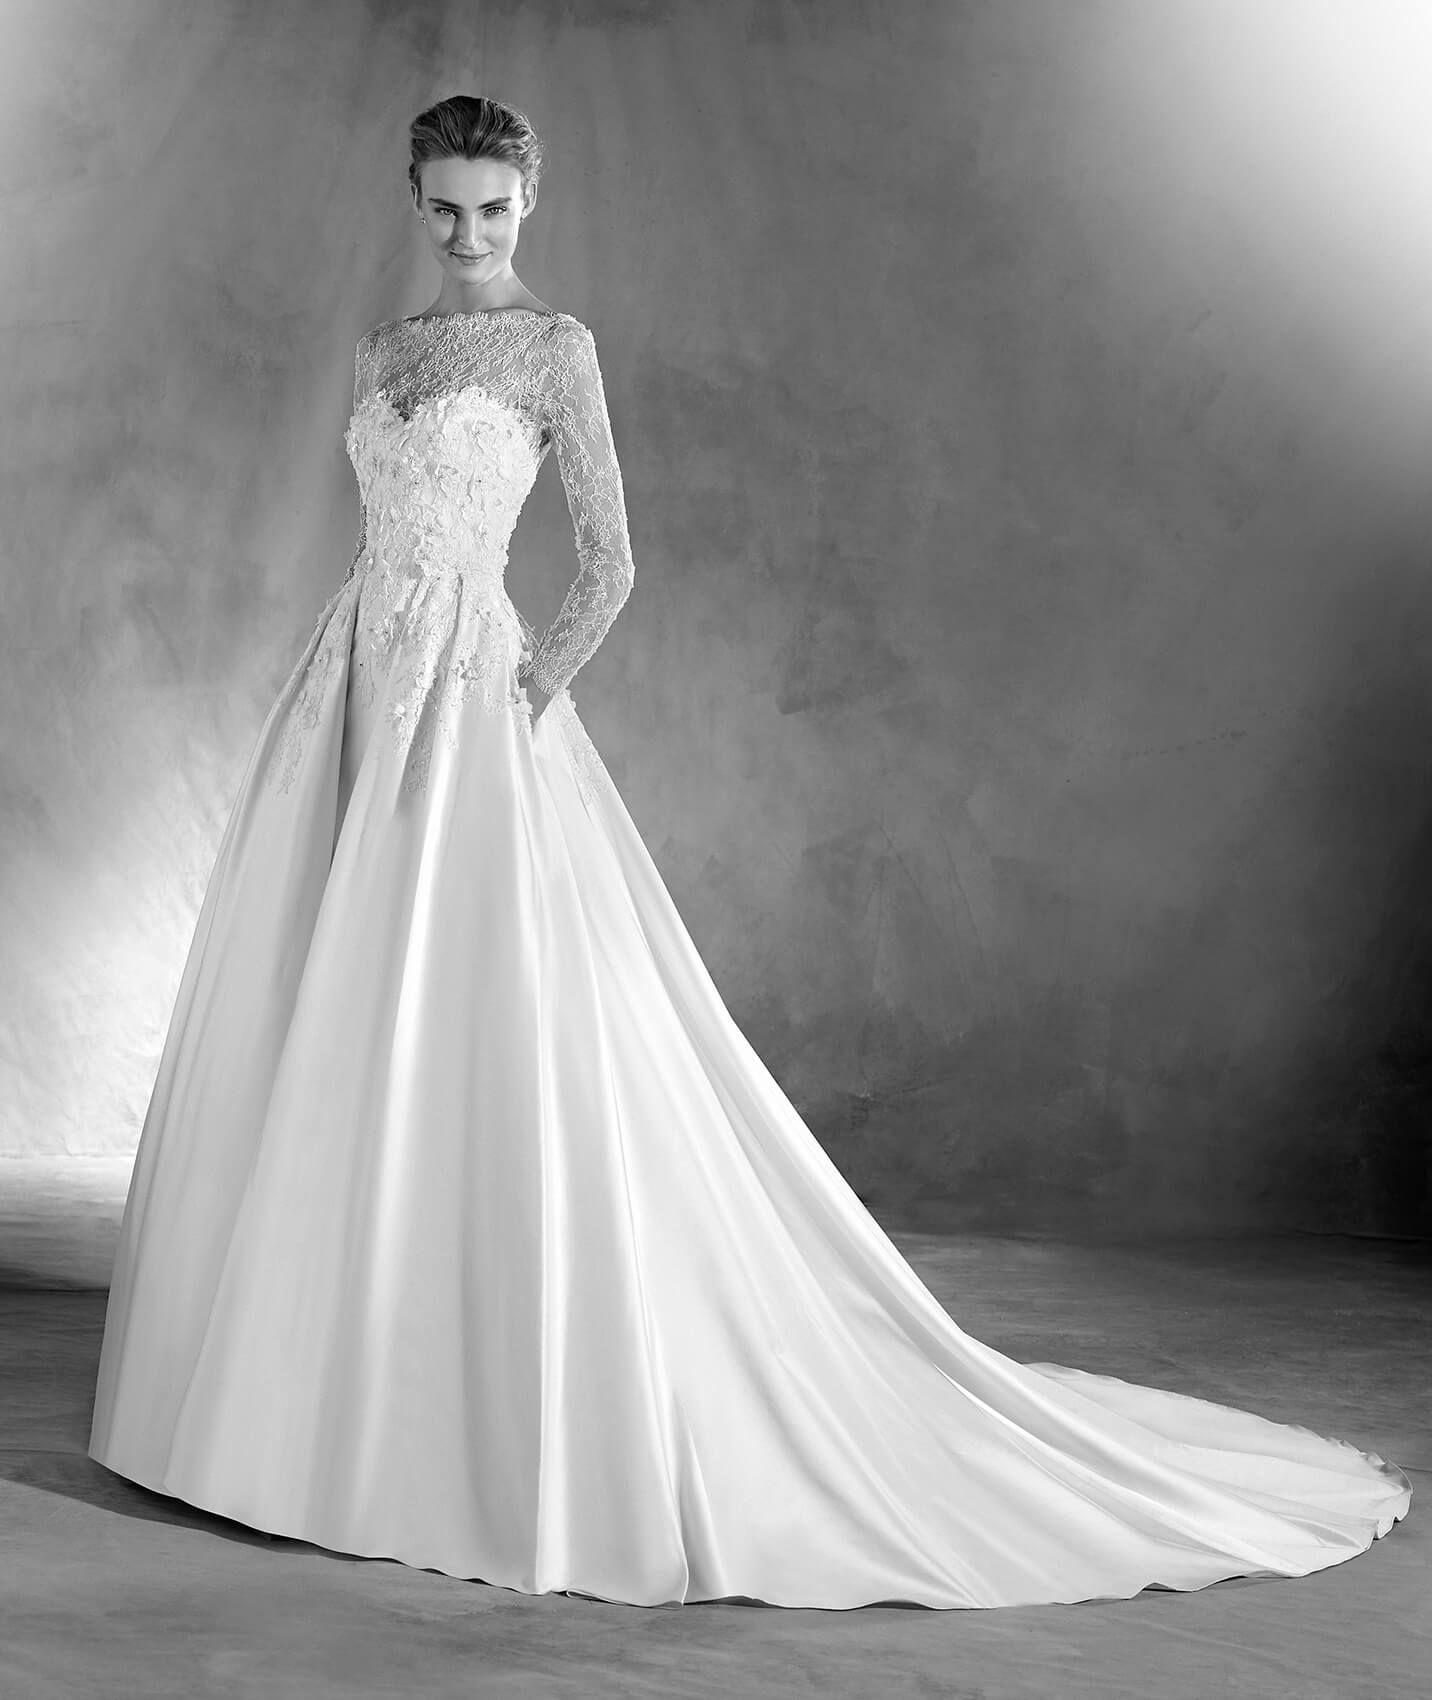 Elmira - Wedding dress with a Princess style design | Wedding Love ...